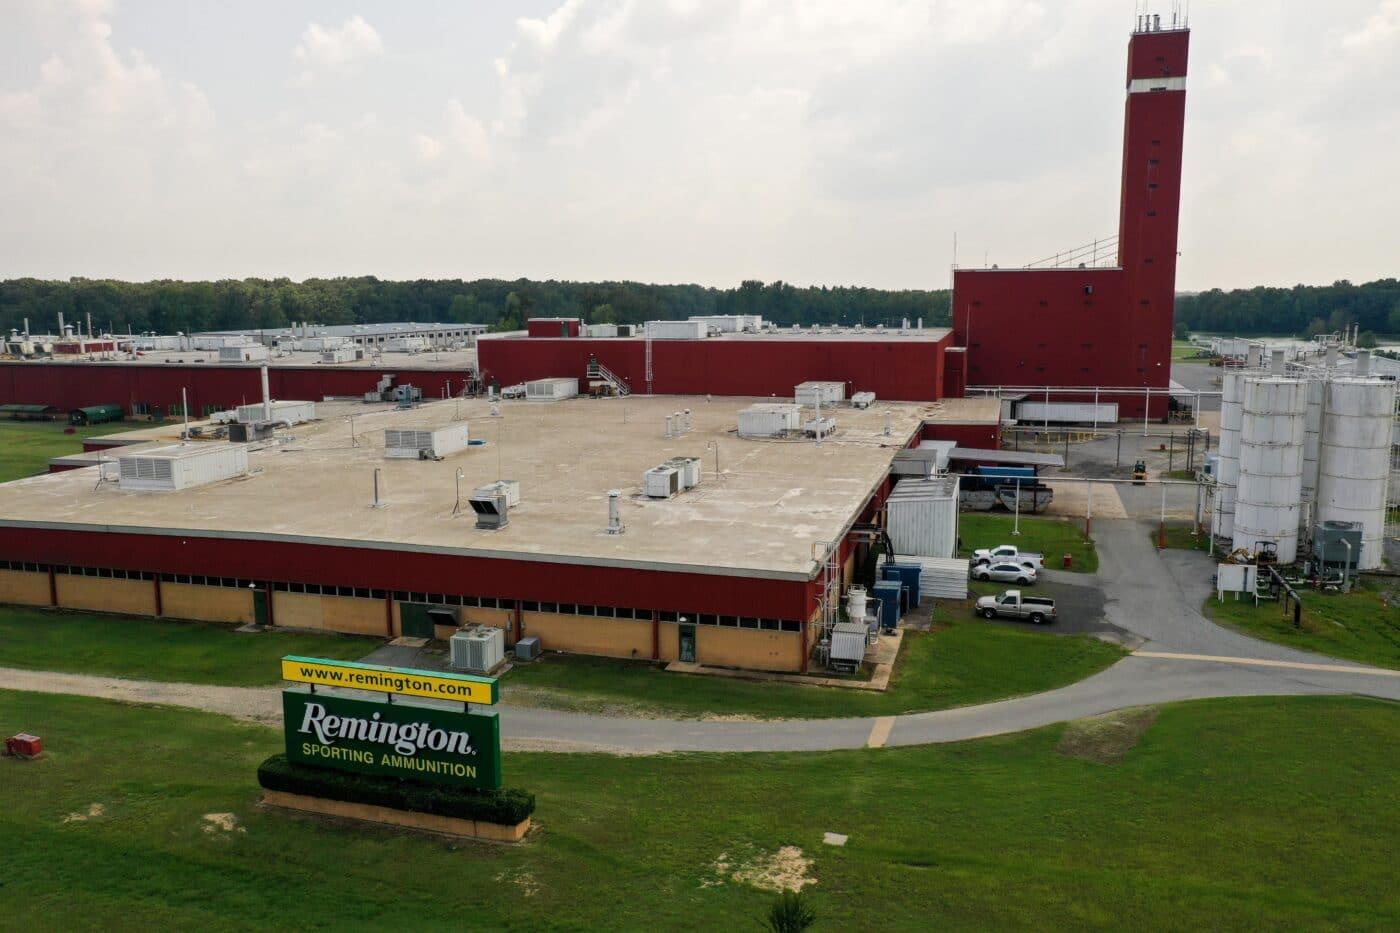 Remington Ammunition plant in Lonoke, Arkansas